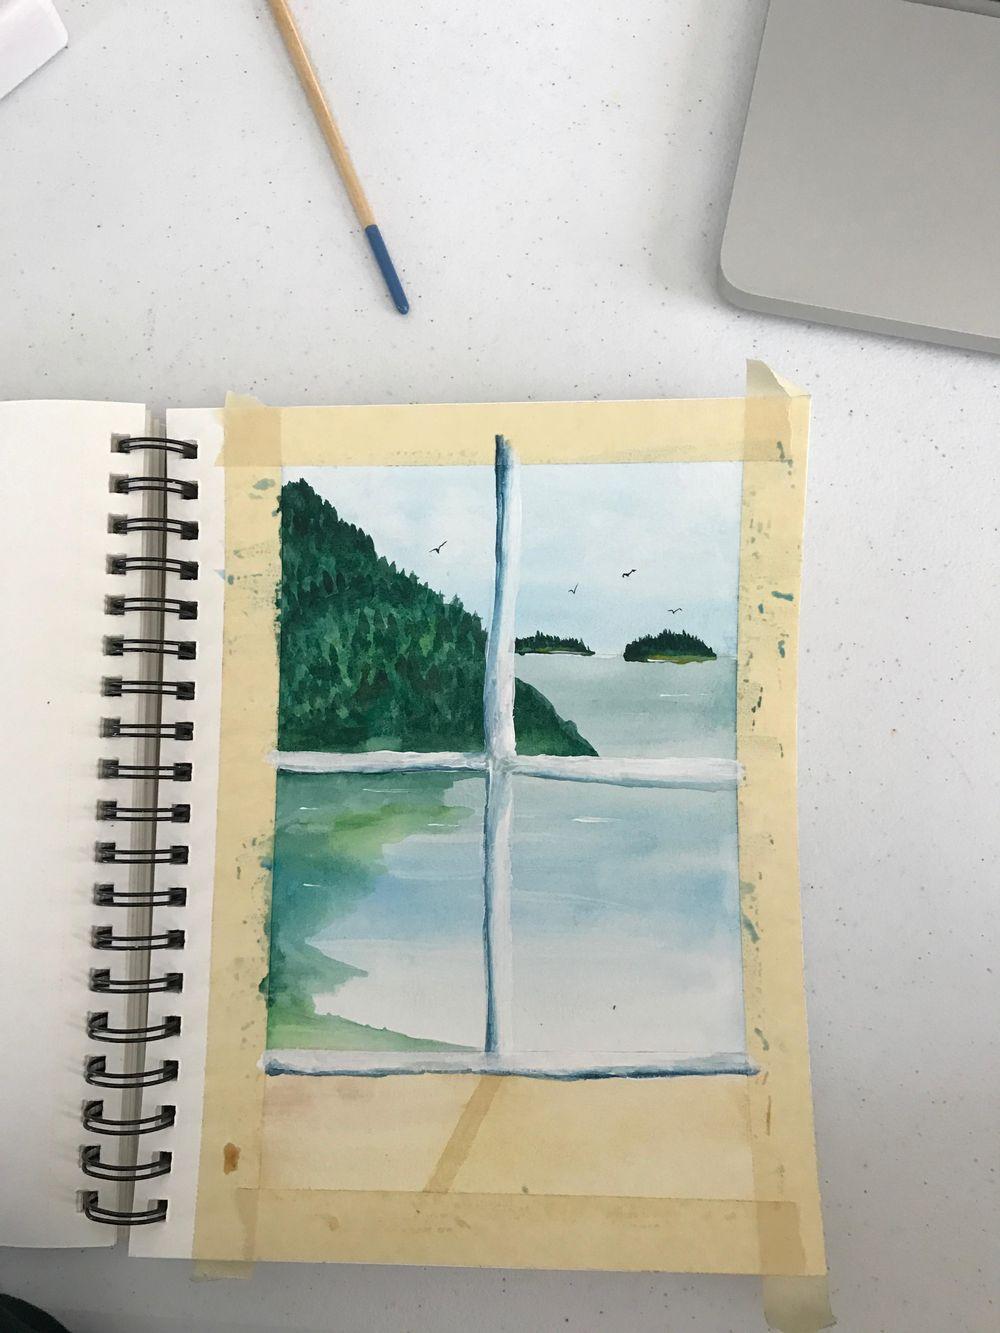 coastal painting - image 1 - student project